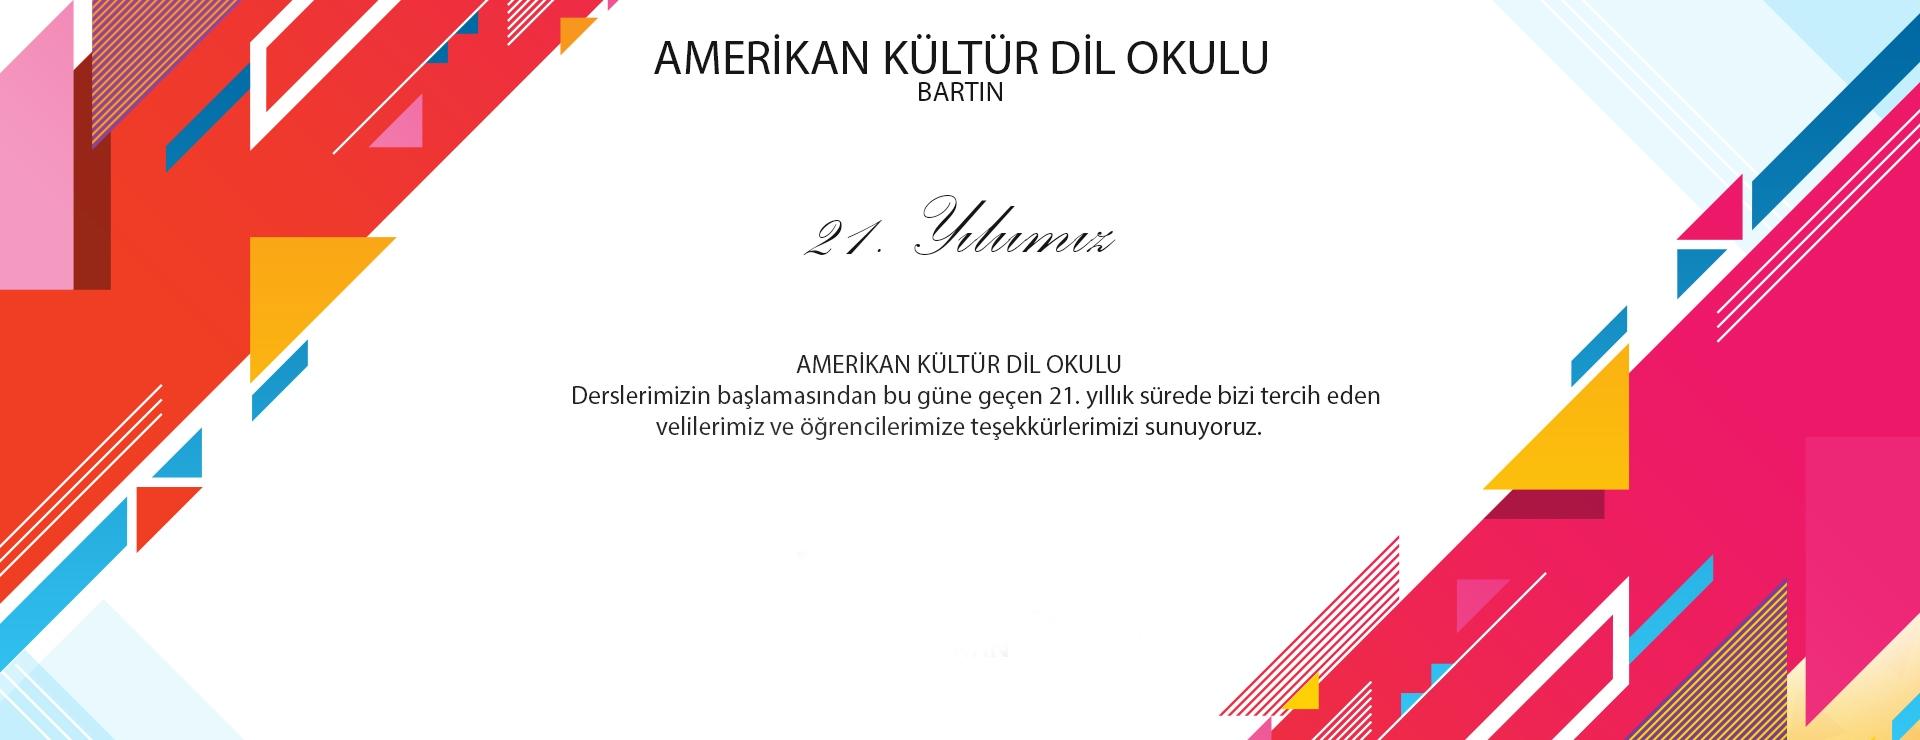 Bartin Ozel Amerikan Kultur Koleji